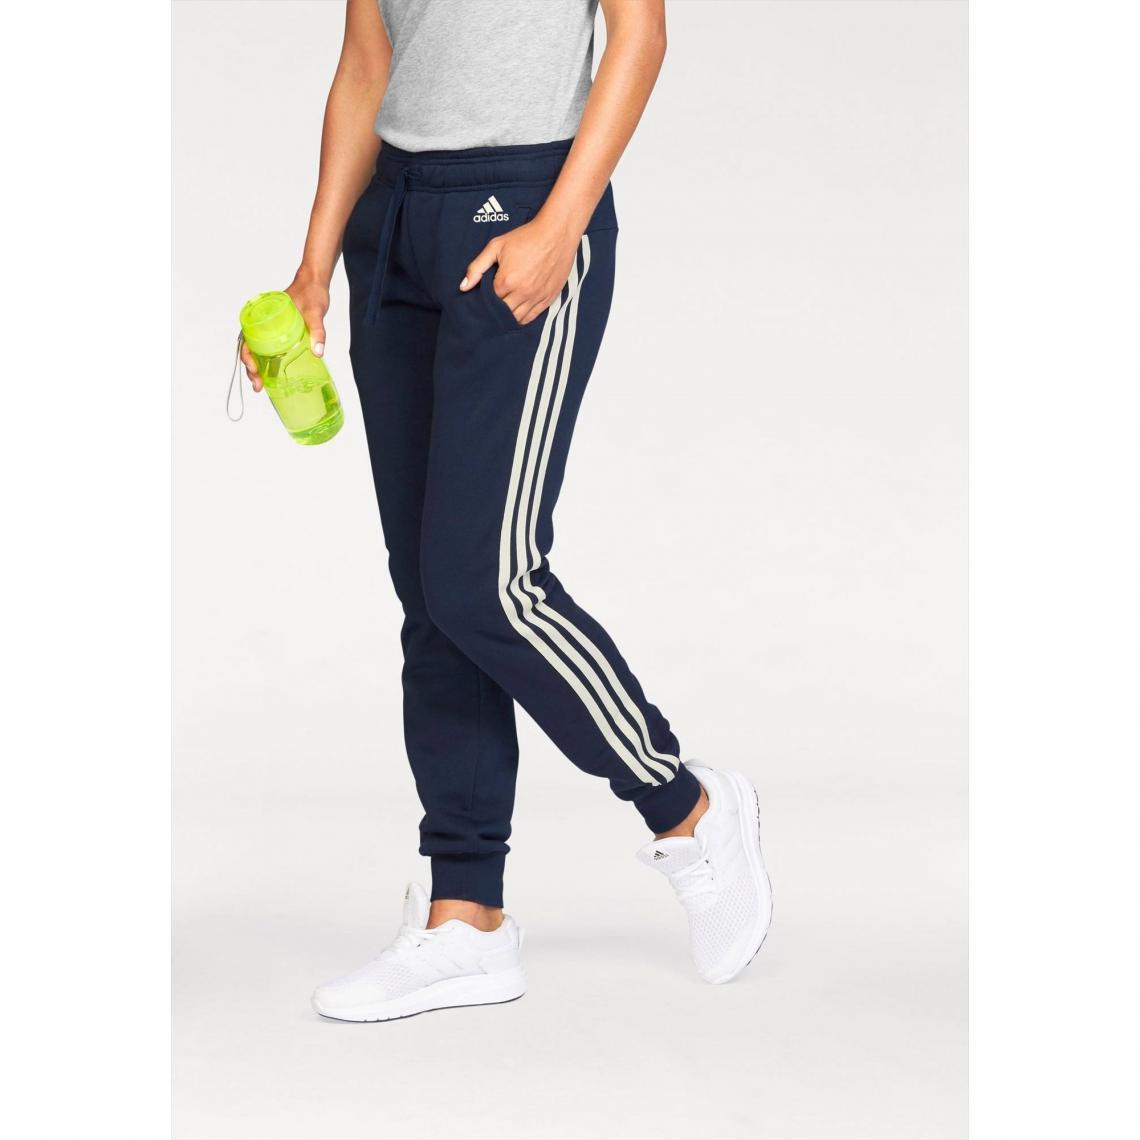 Jogging adidas Performance Essential 3S pant cuffed femme - Multicolore Adidas  Performance Femme 8bf71ad238c